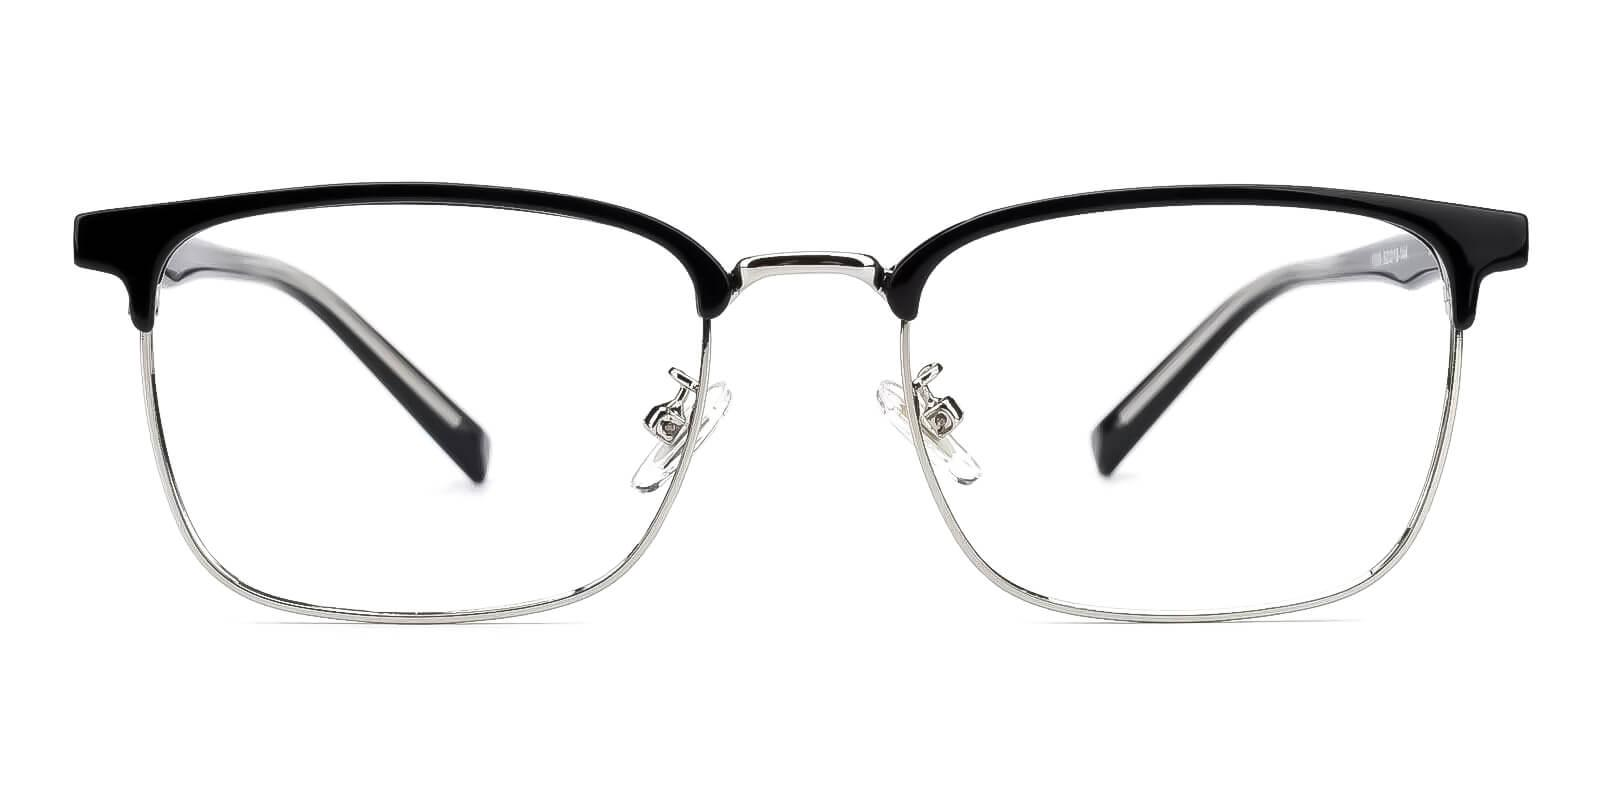 Azur Silver TR Eyeglasses , Fashion , NosePads Frames from ABBE Glasses